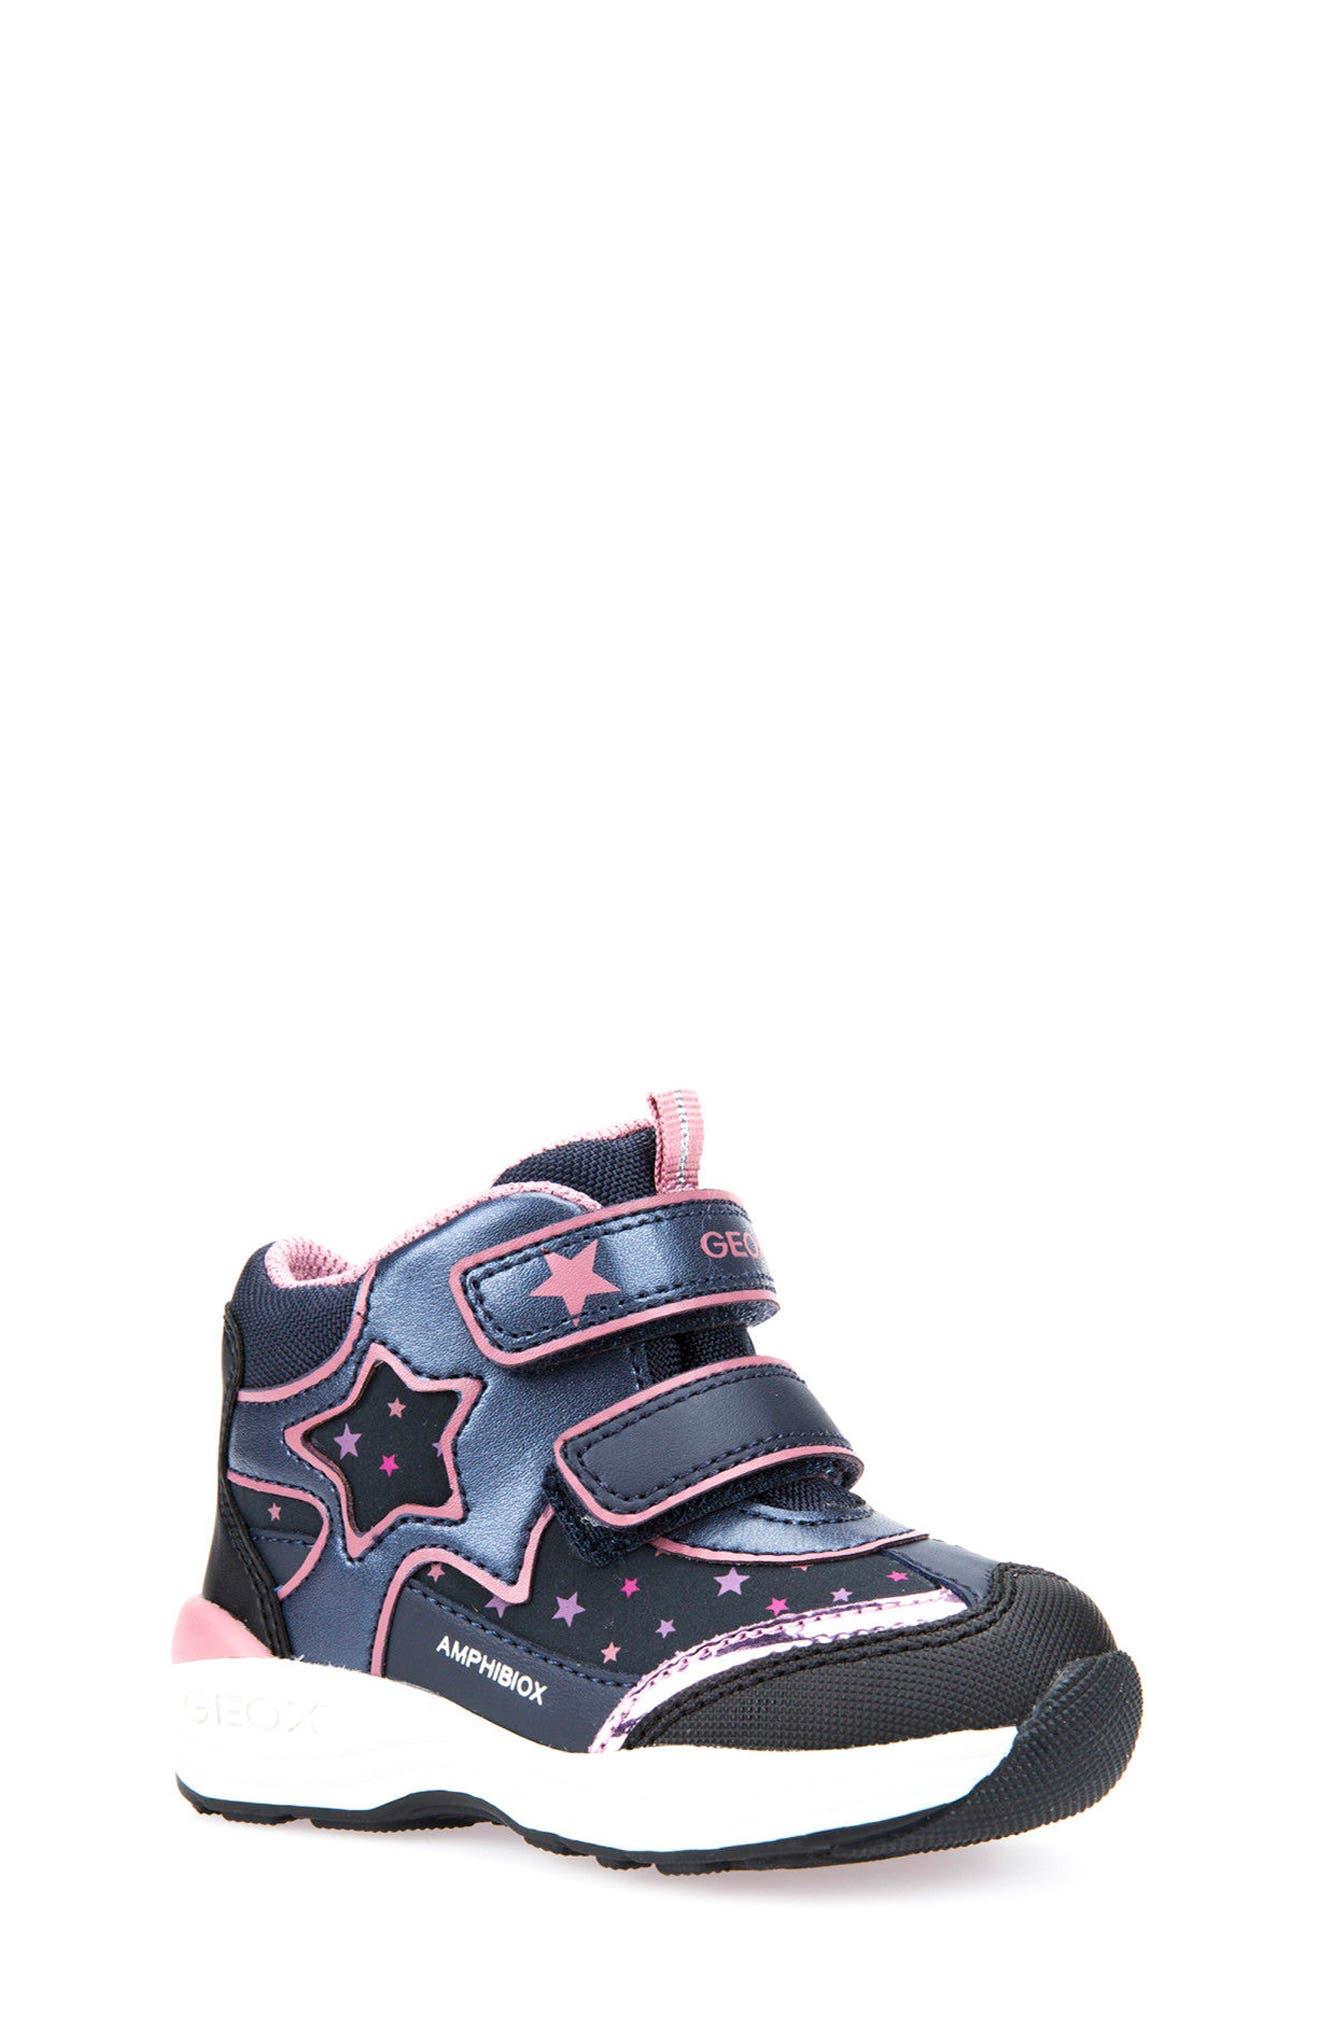 Geox Gulp ABX Waterproof Star Sneaker Boot (Walker & Toddler)